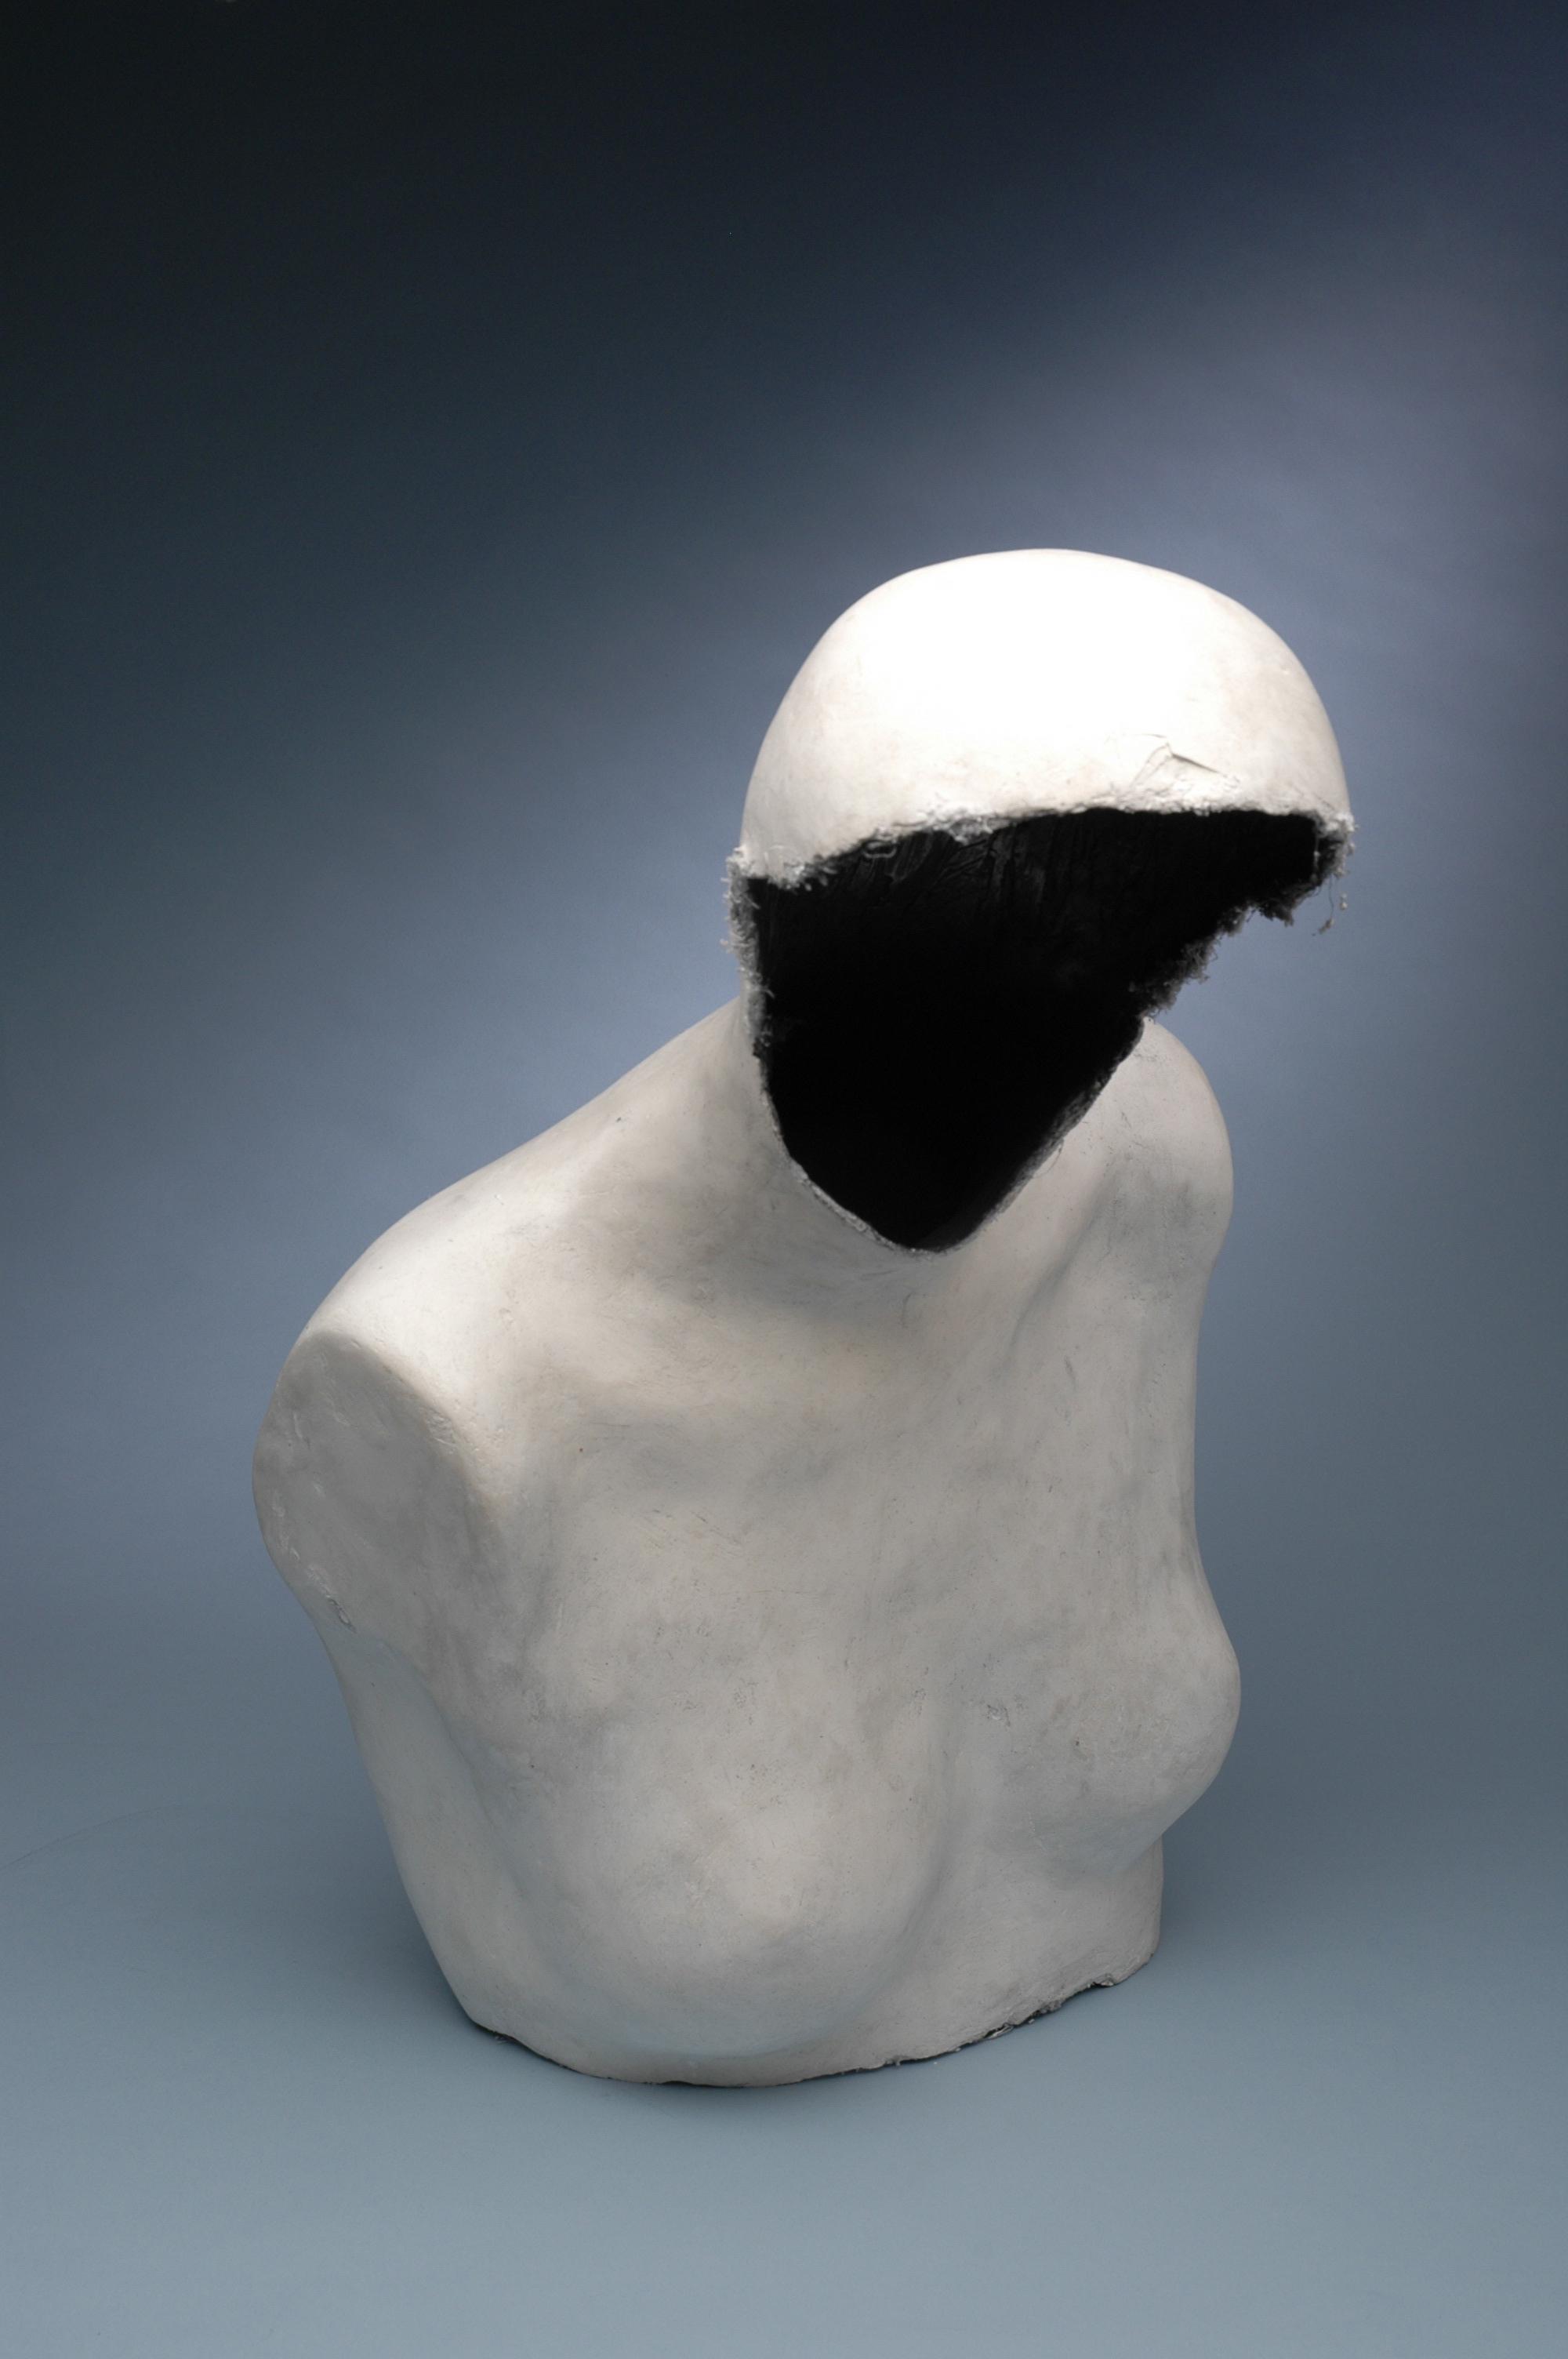 """Experimental Figure 1"" 3/4 scale, plaster, charcoal powder."